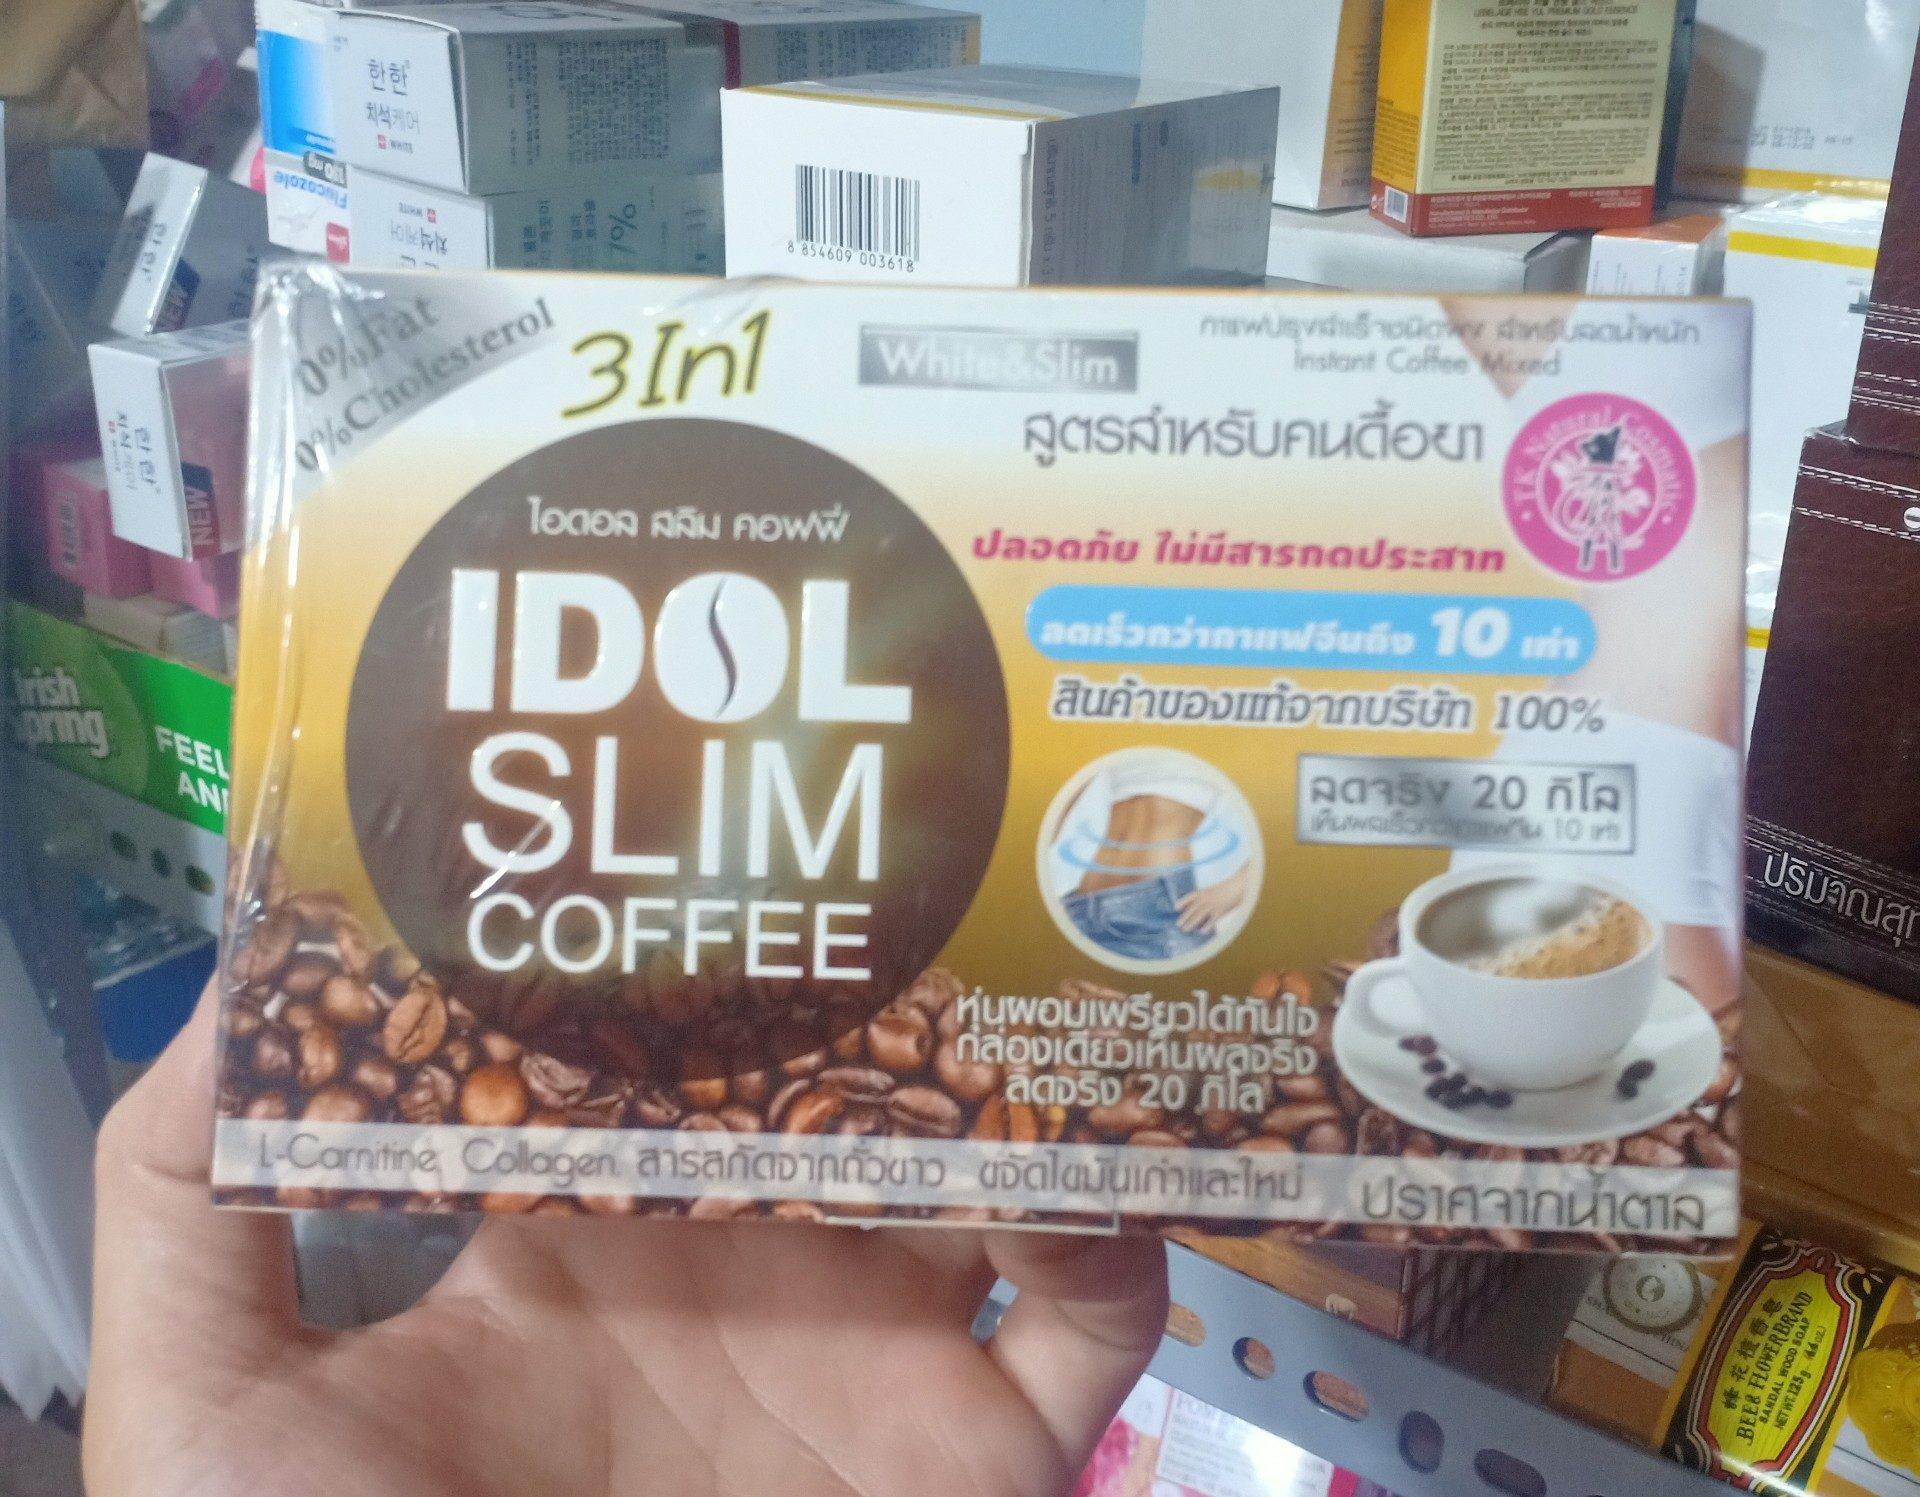 Cafe giảm cân Idol Slim 3in1 Thái Lan